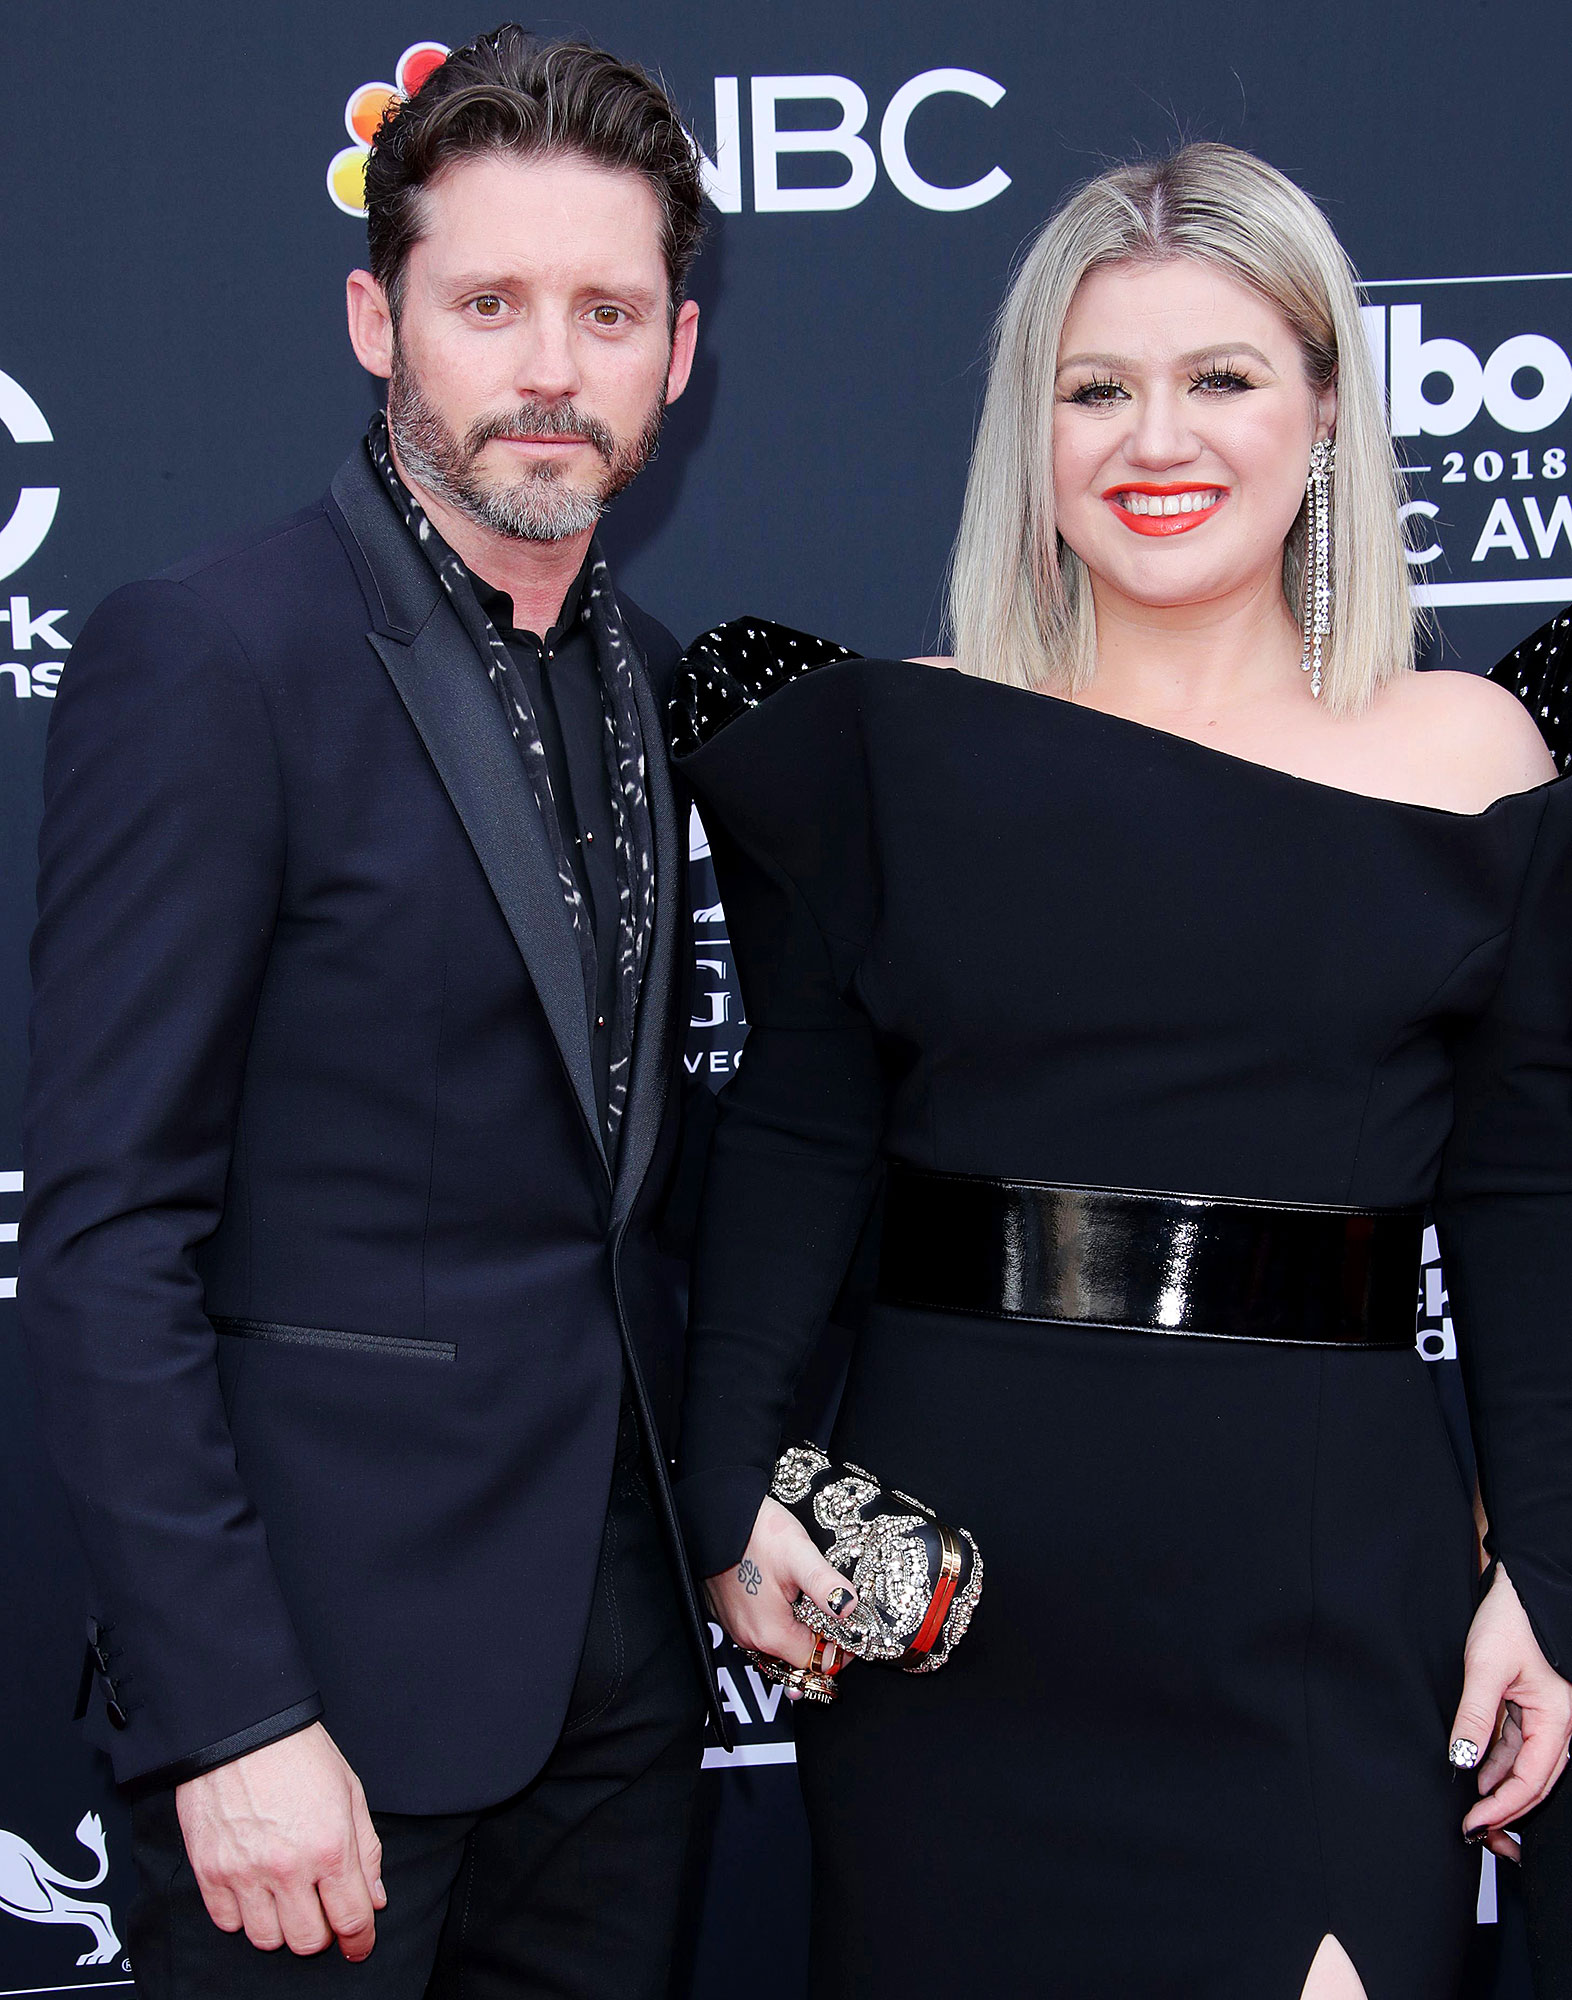 Rebas husband kelly son clarkson Kelly Clarkson